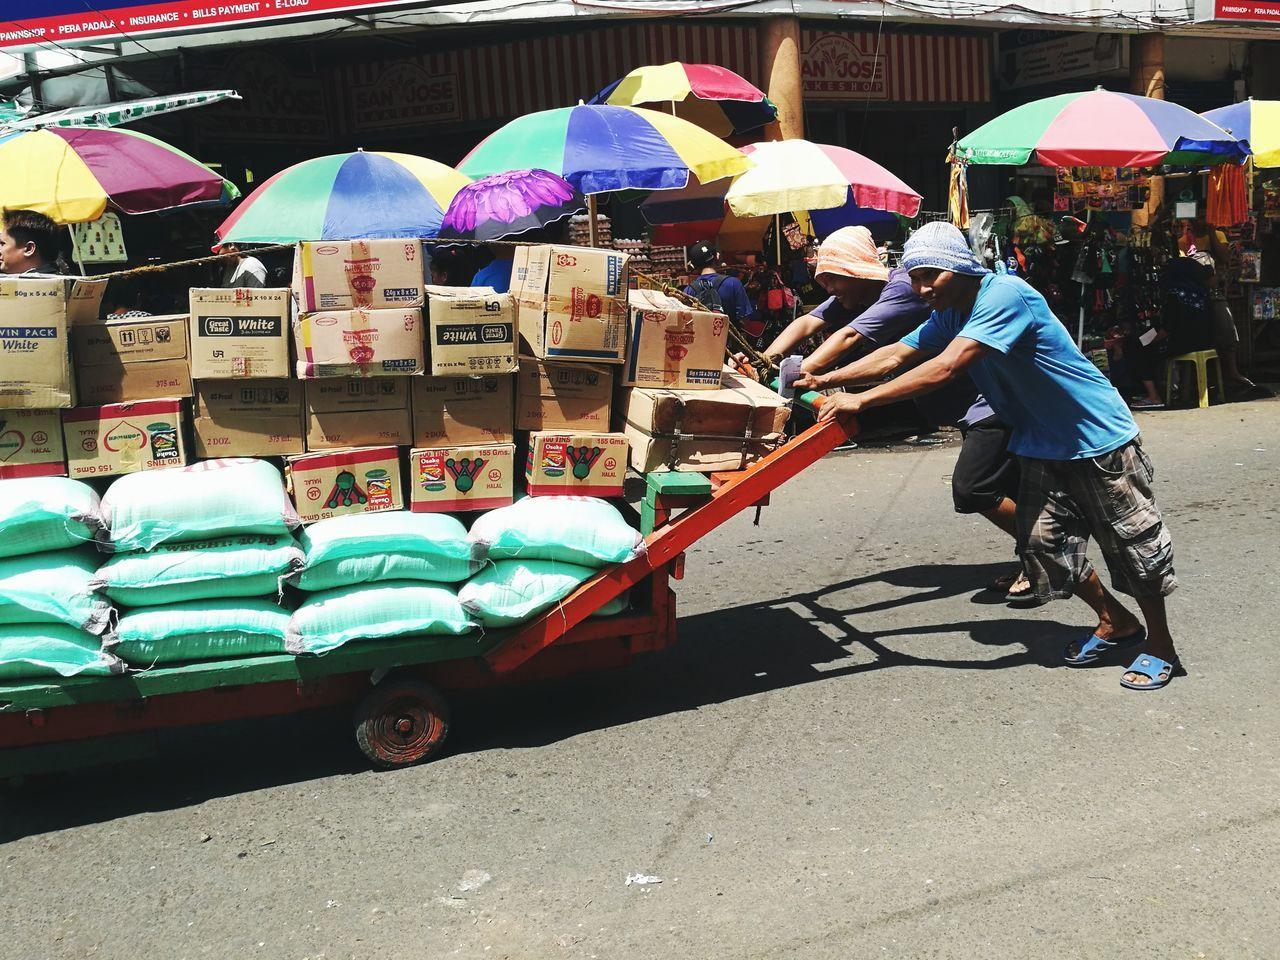 EyeEmPHLaborDay2017 Real People Market Street Men Outdoors Streetphotography Livelihood Carbon Market, Cebu HuaweiP9 DualLens Oo